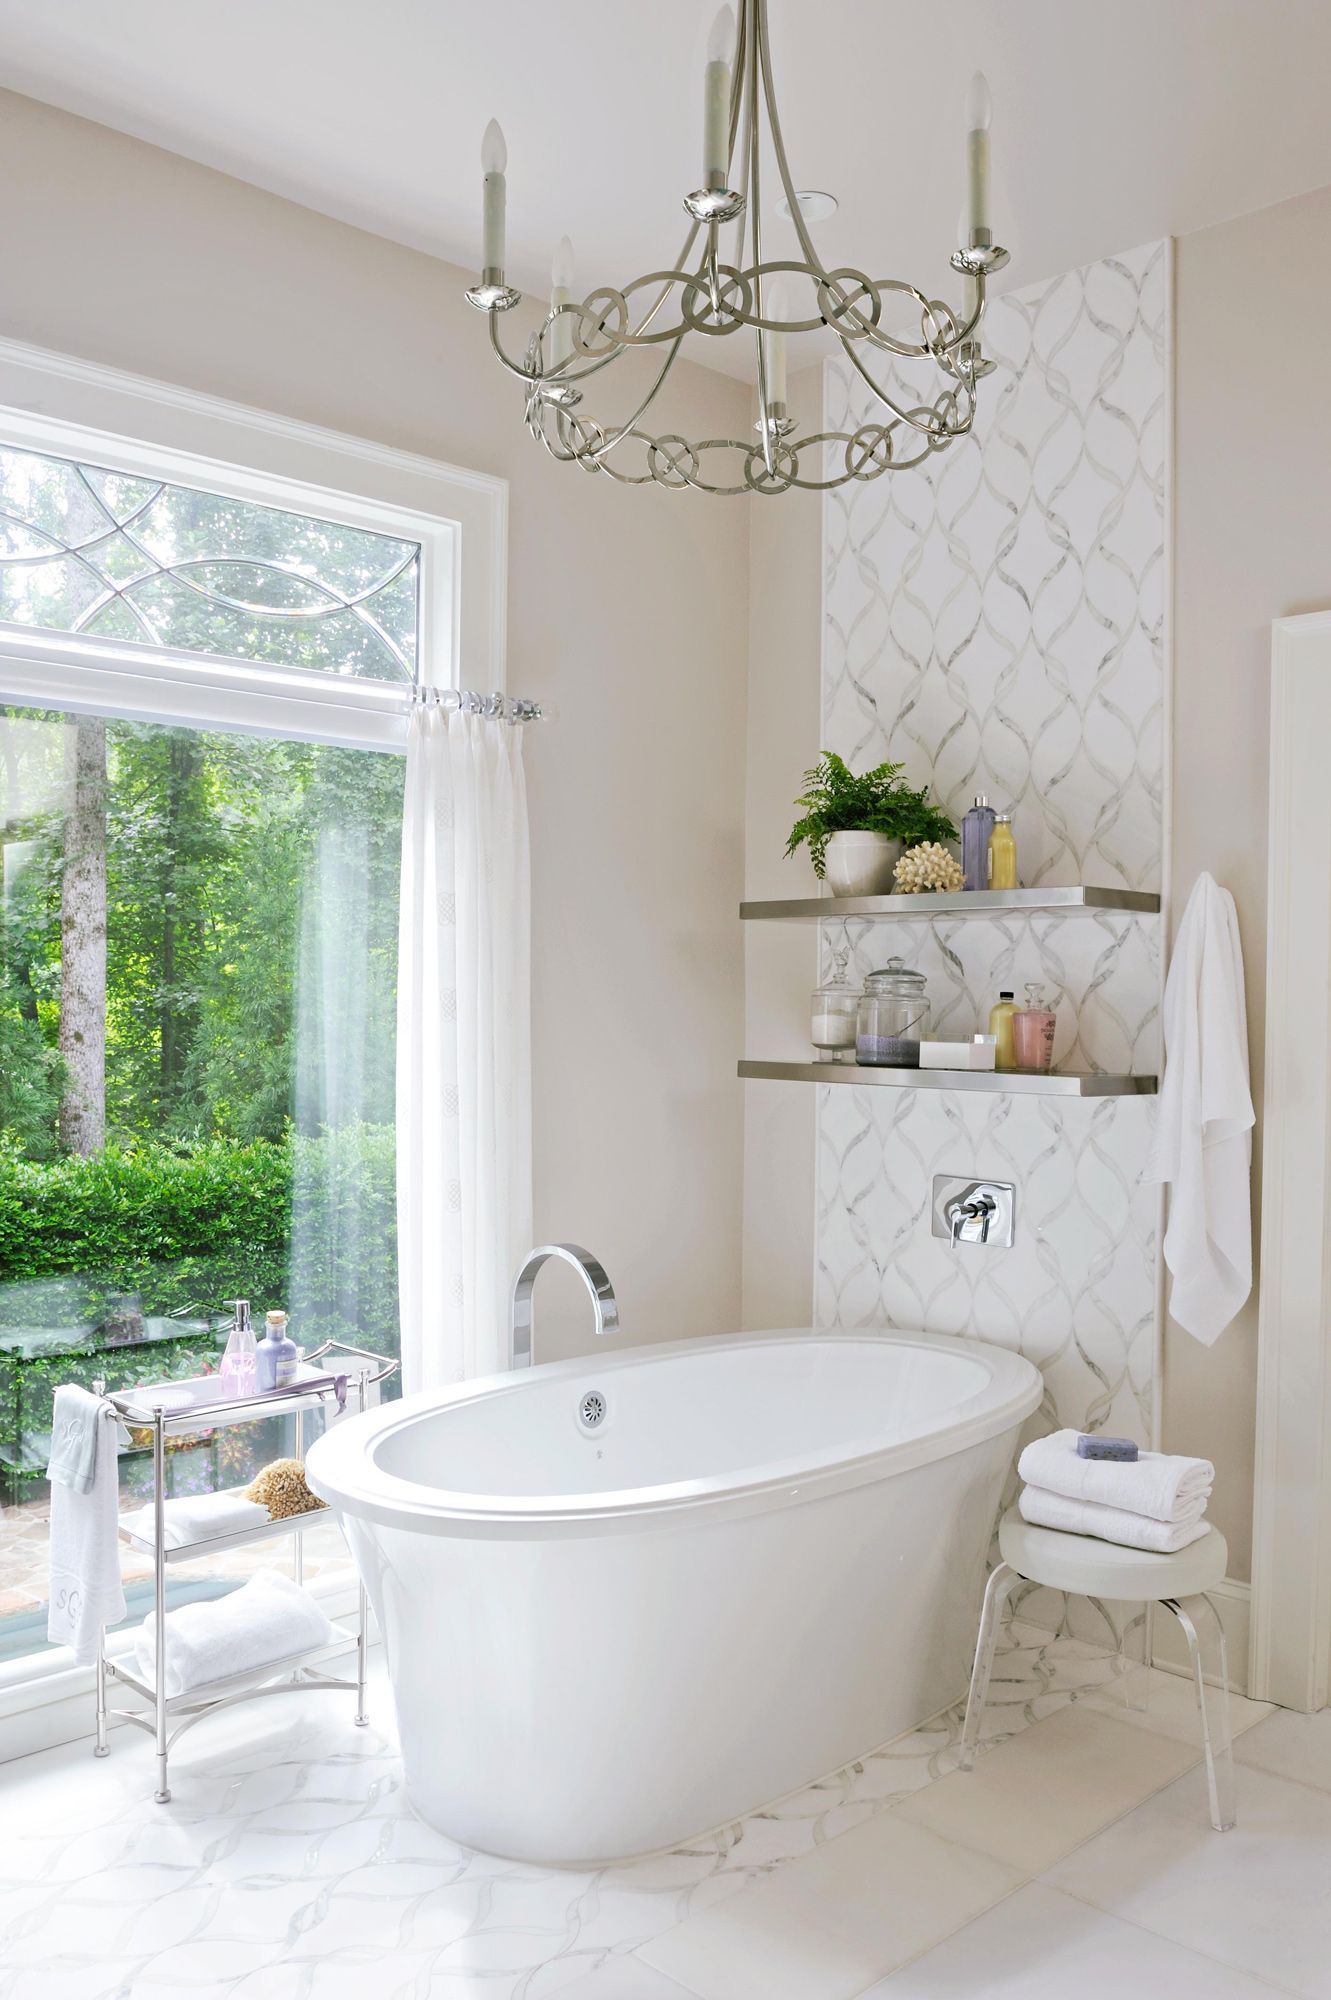 47+ Beige and white bathroom information